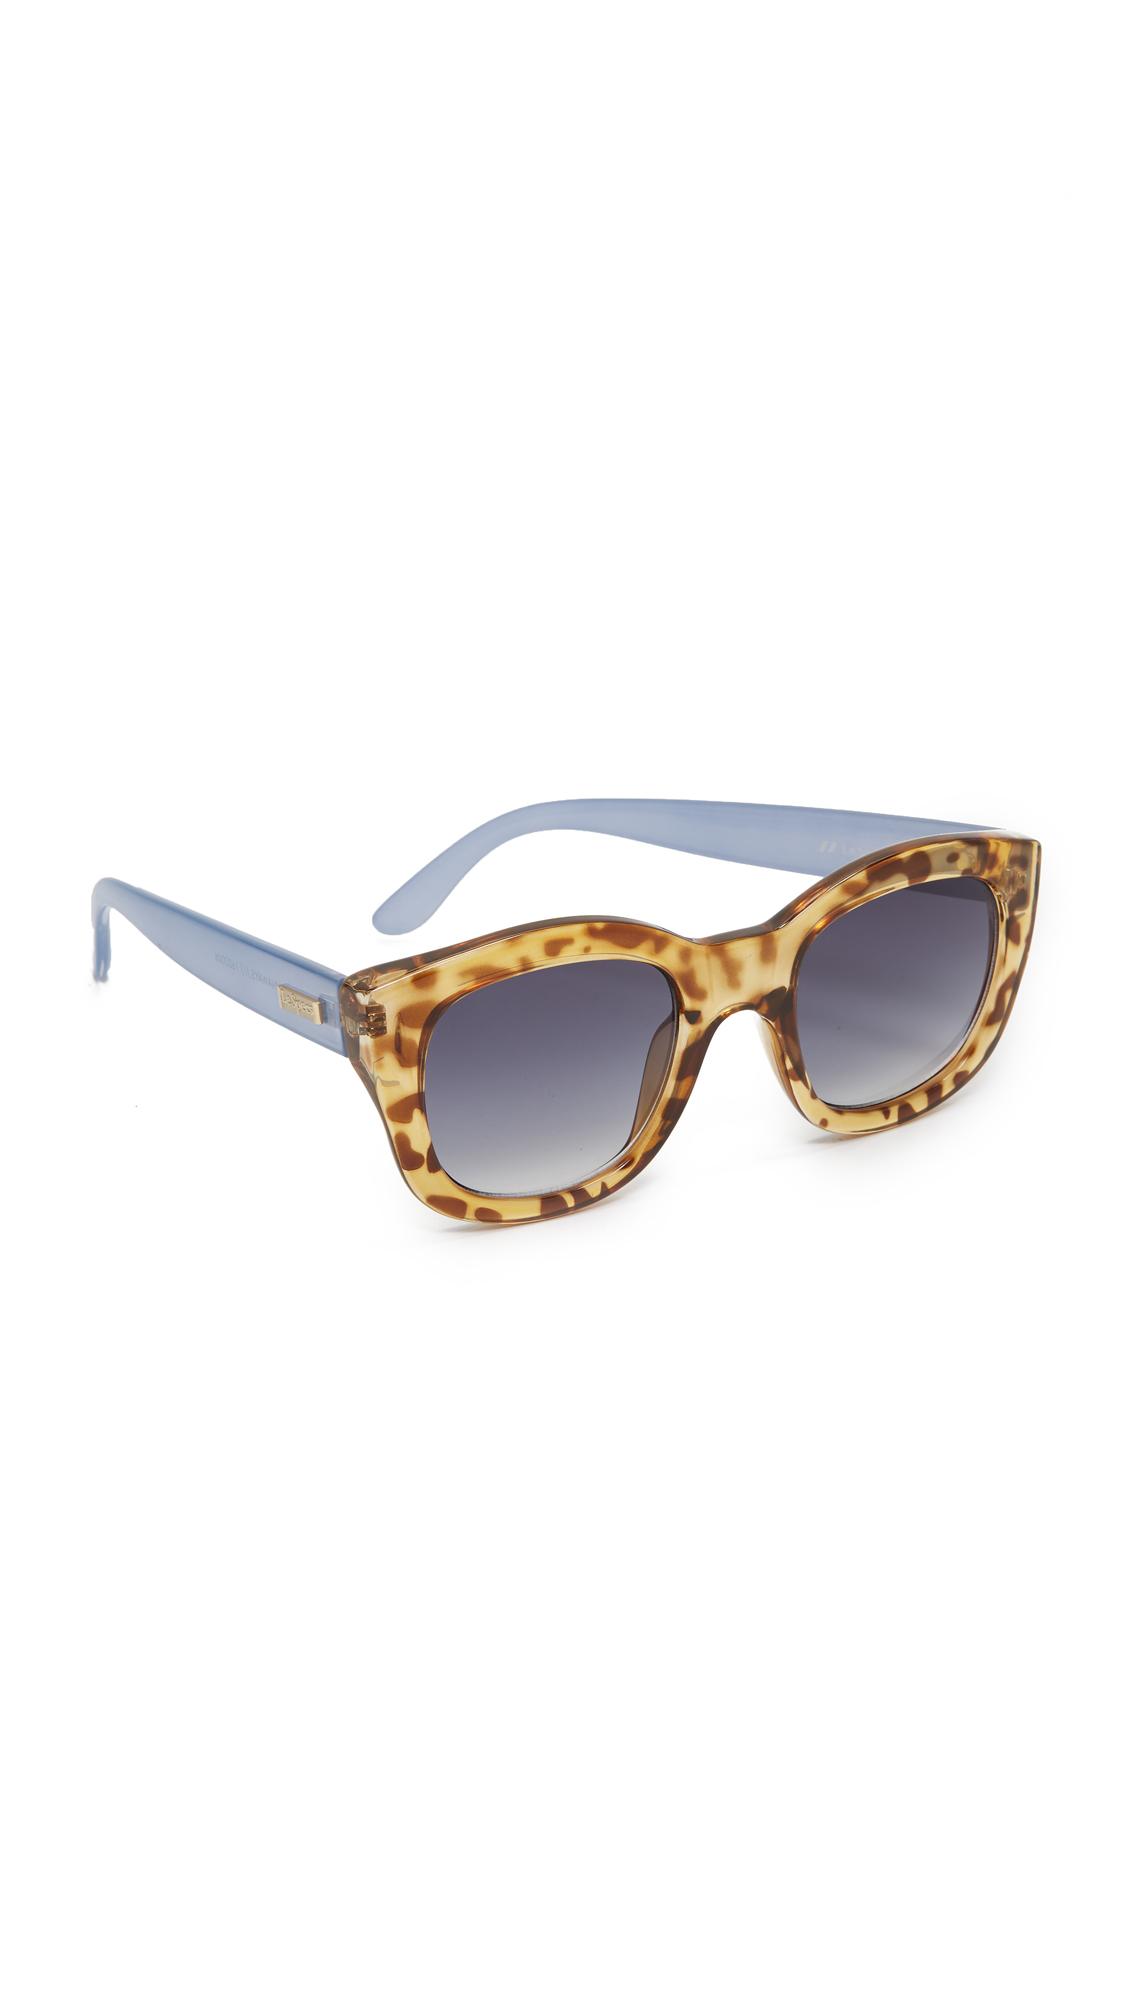 Le Specs Runaway Sunglasses - Leopard Tort Chambray/Smoke at Shopbop